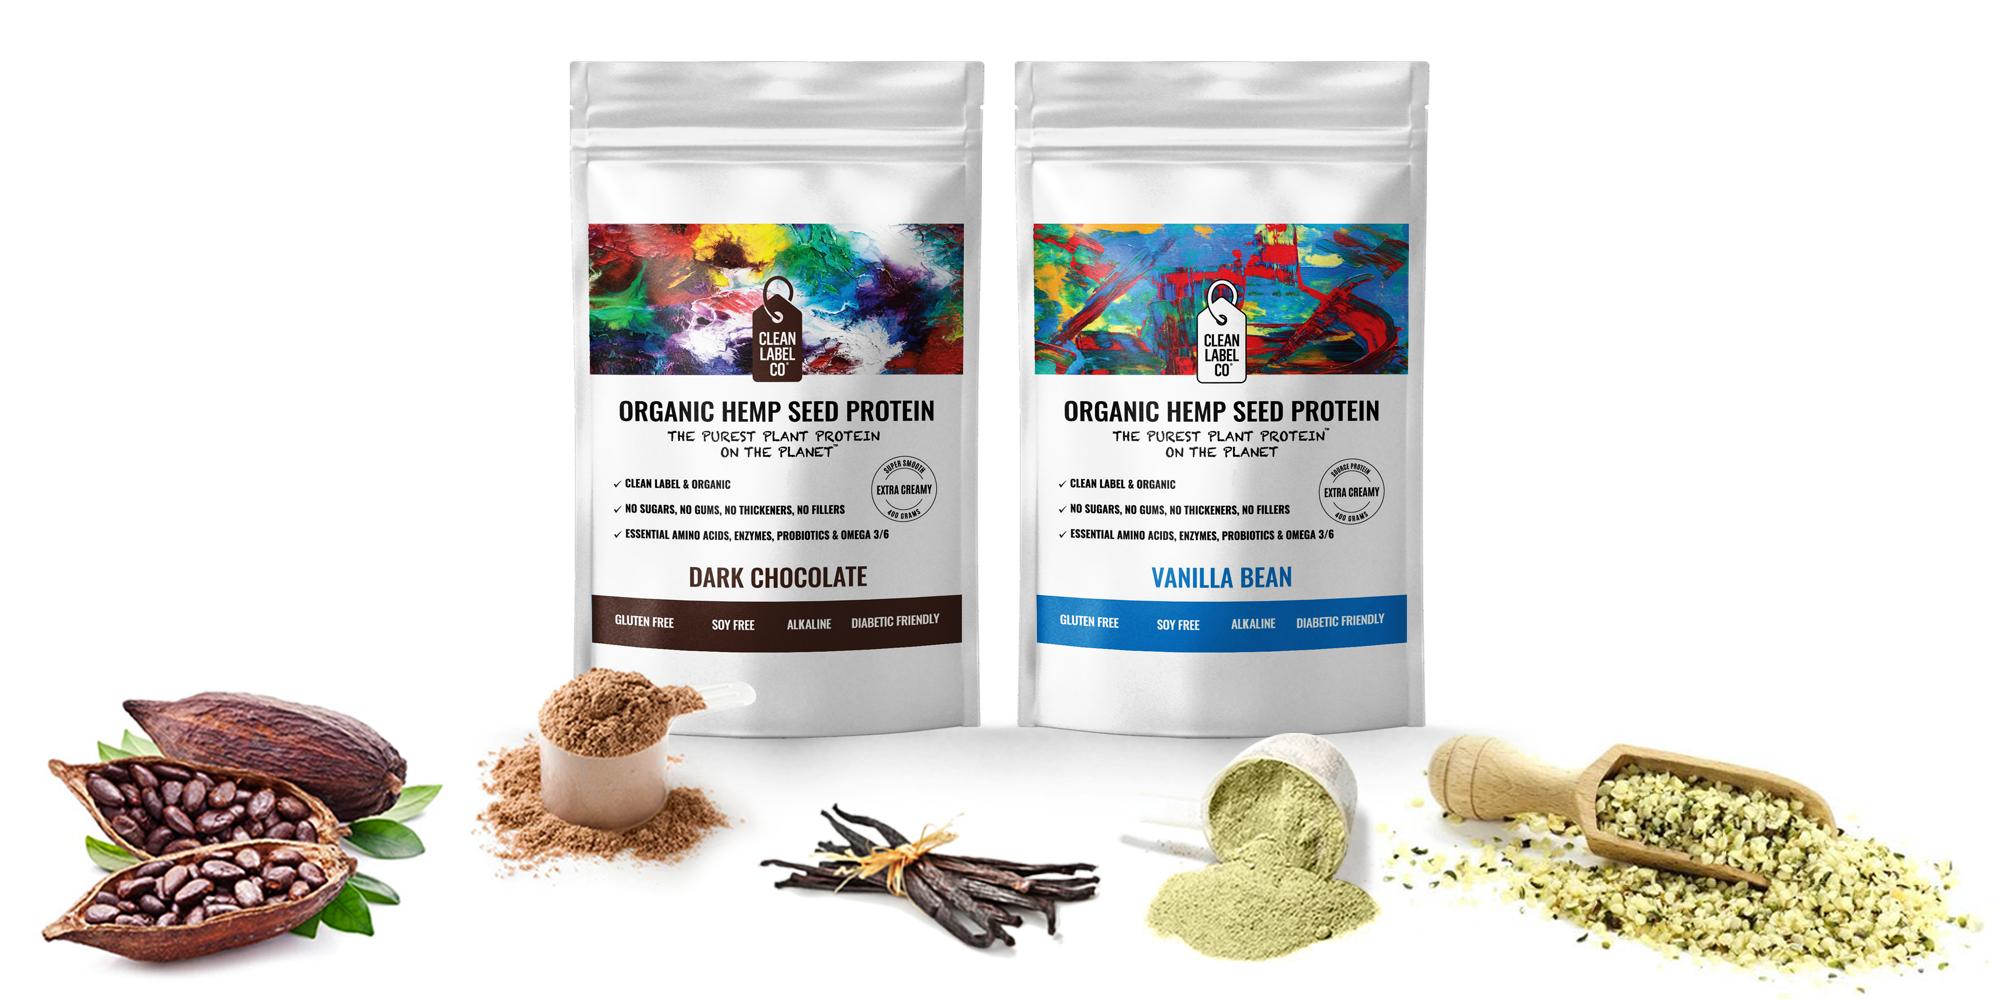 Hemp Protein Powder Australia Organic Hemp Seed Protein Cleanlabelco